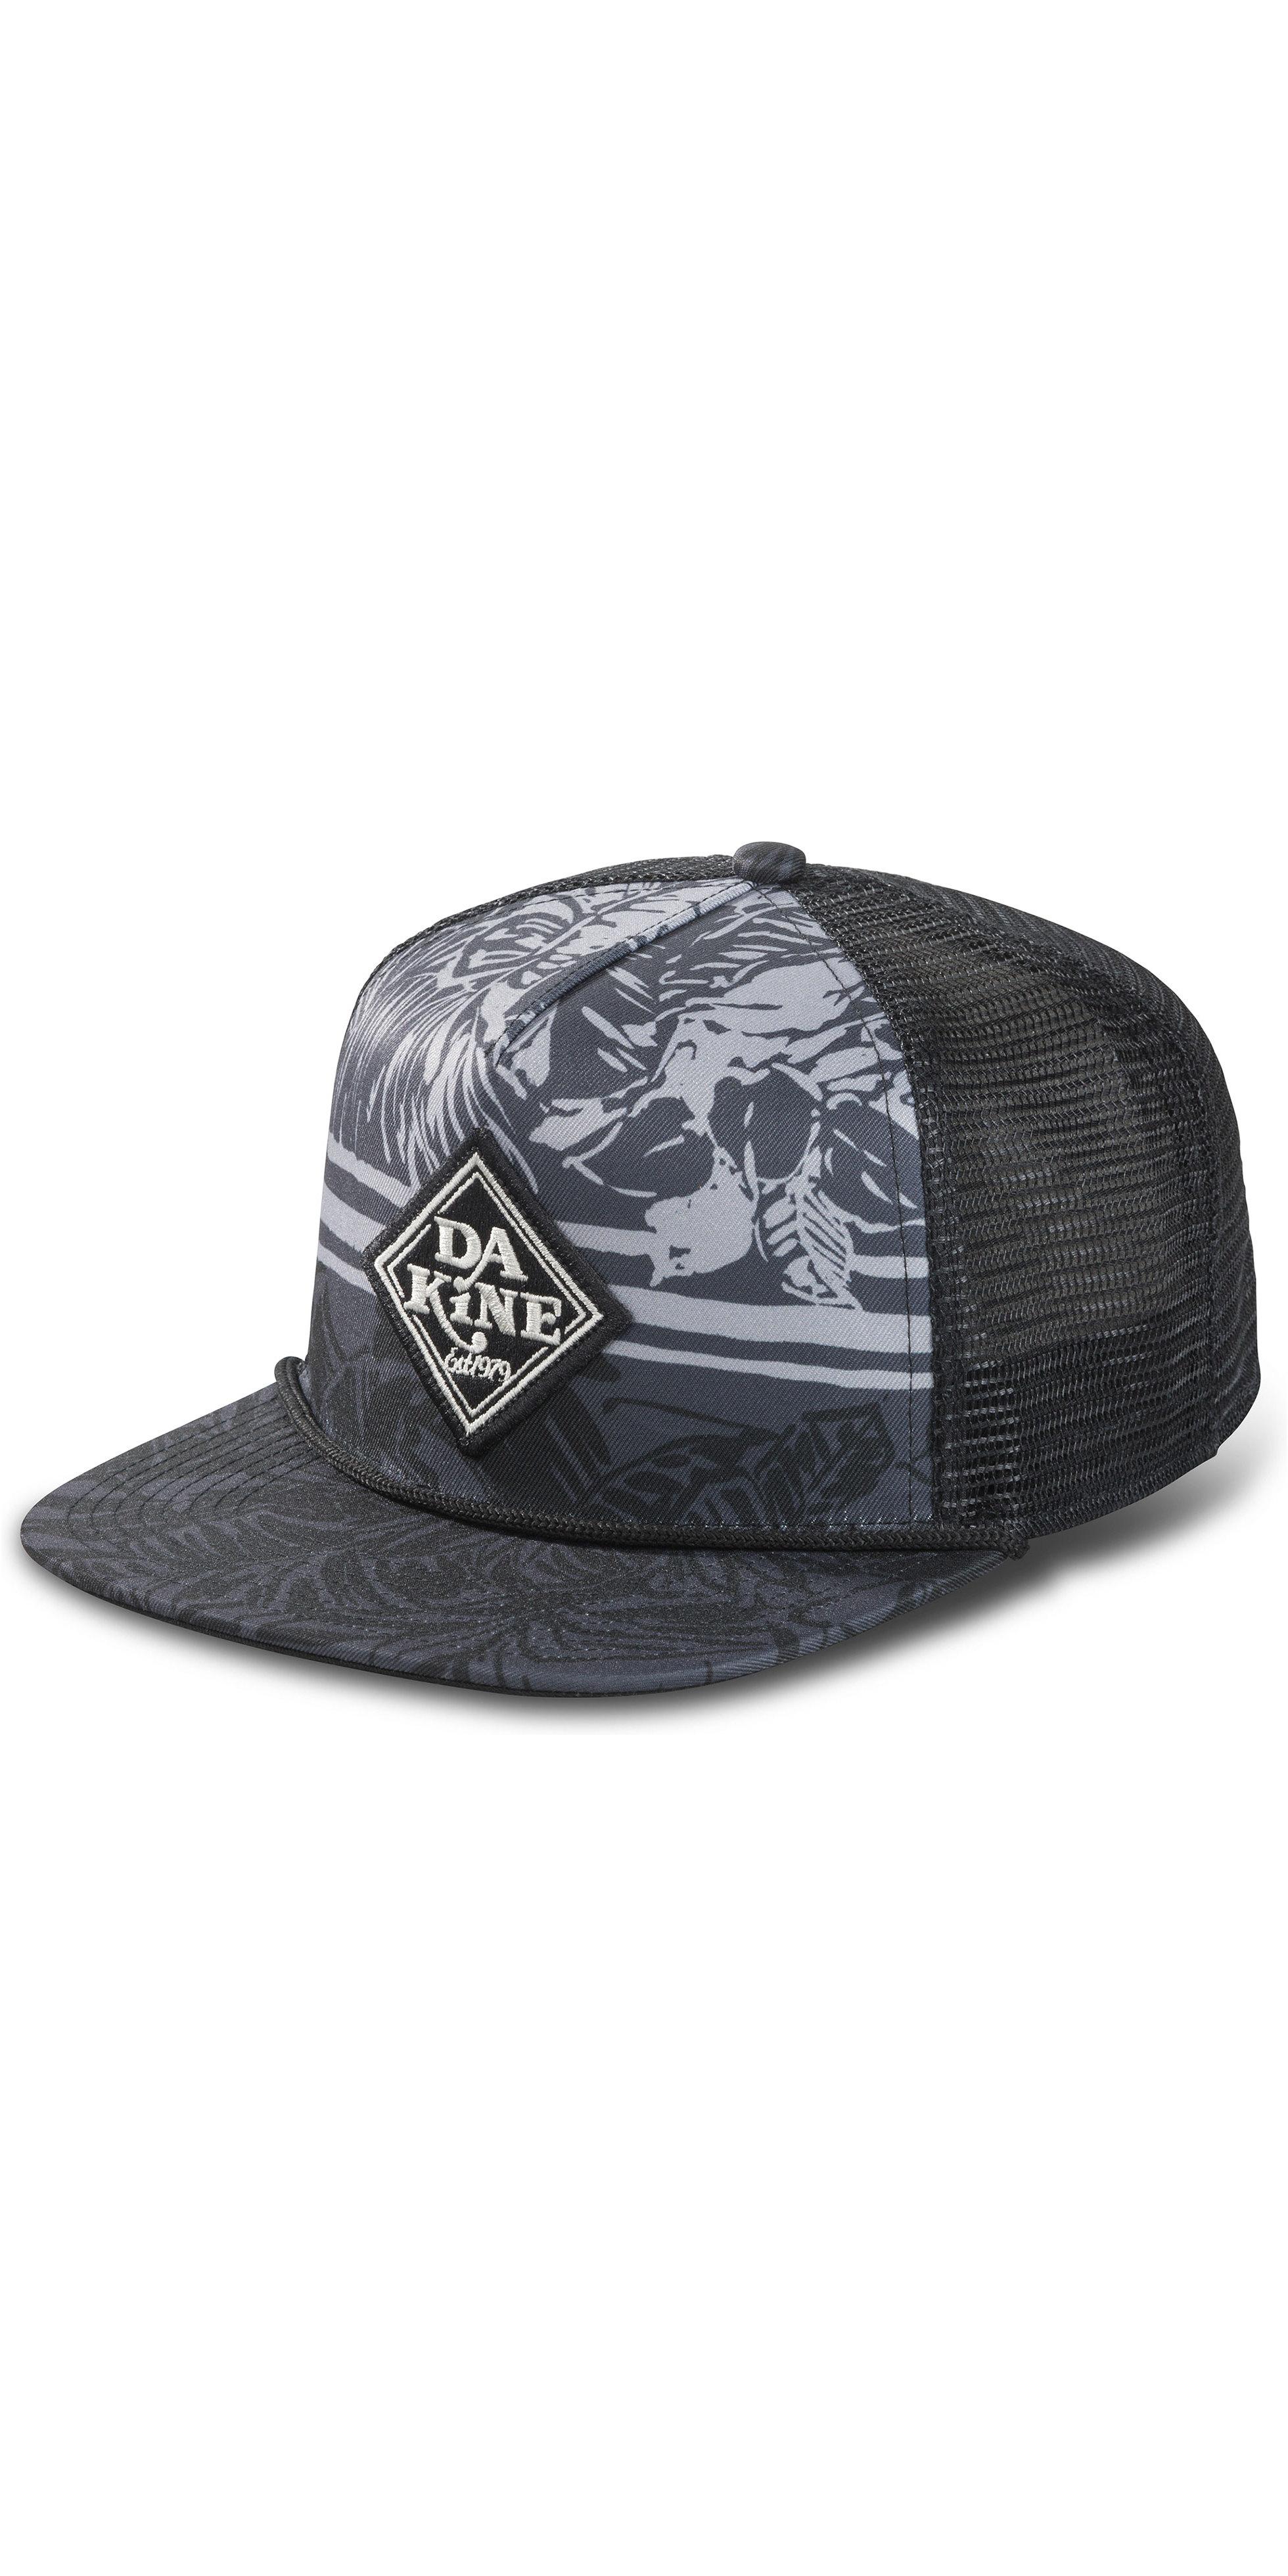 eacaf386615c5 2019 Dakine Classic Diamond Trucker Cap Black 10002462 - Accessories - Mens  - Clothing | Wetsuit Outlet